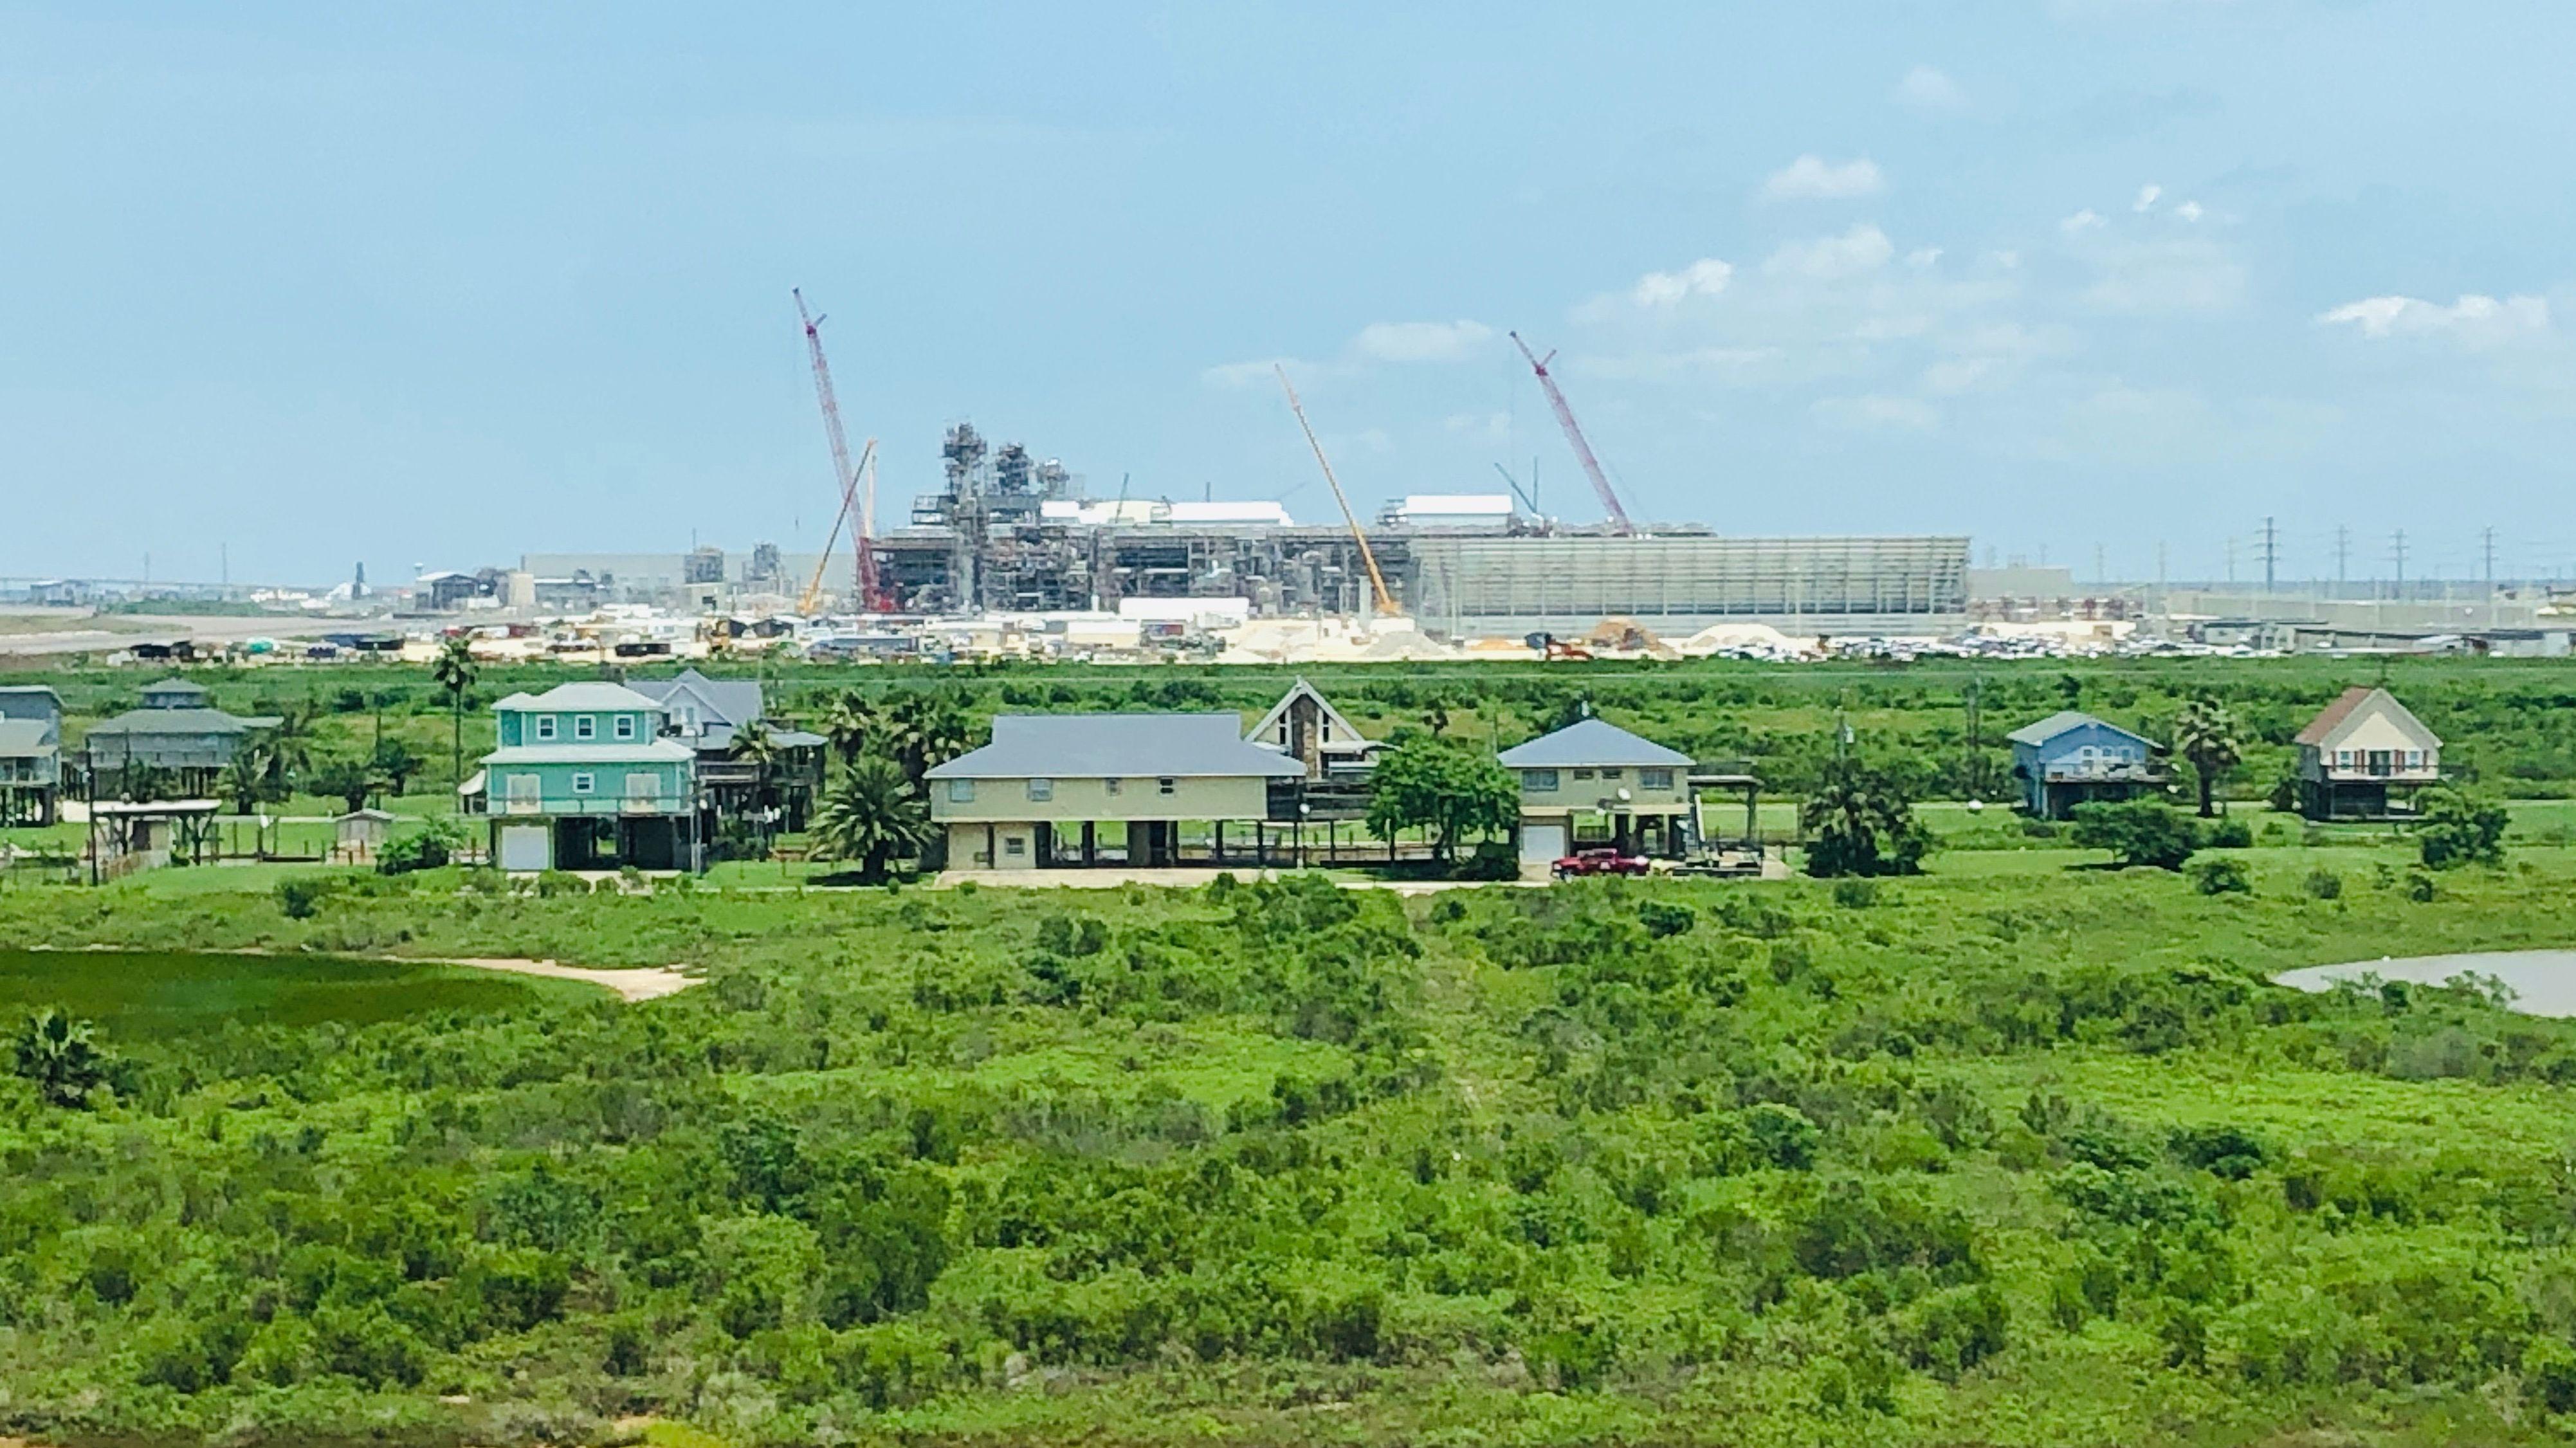 Das Freeport LNG Terminal am Golf von Mexiko